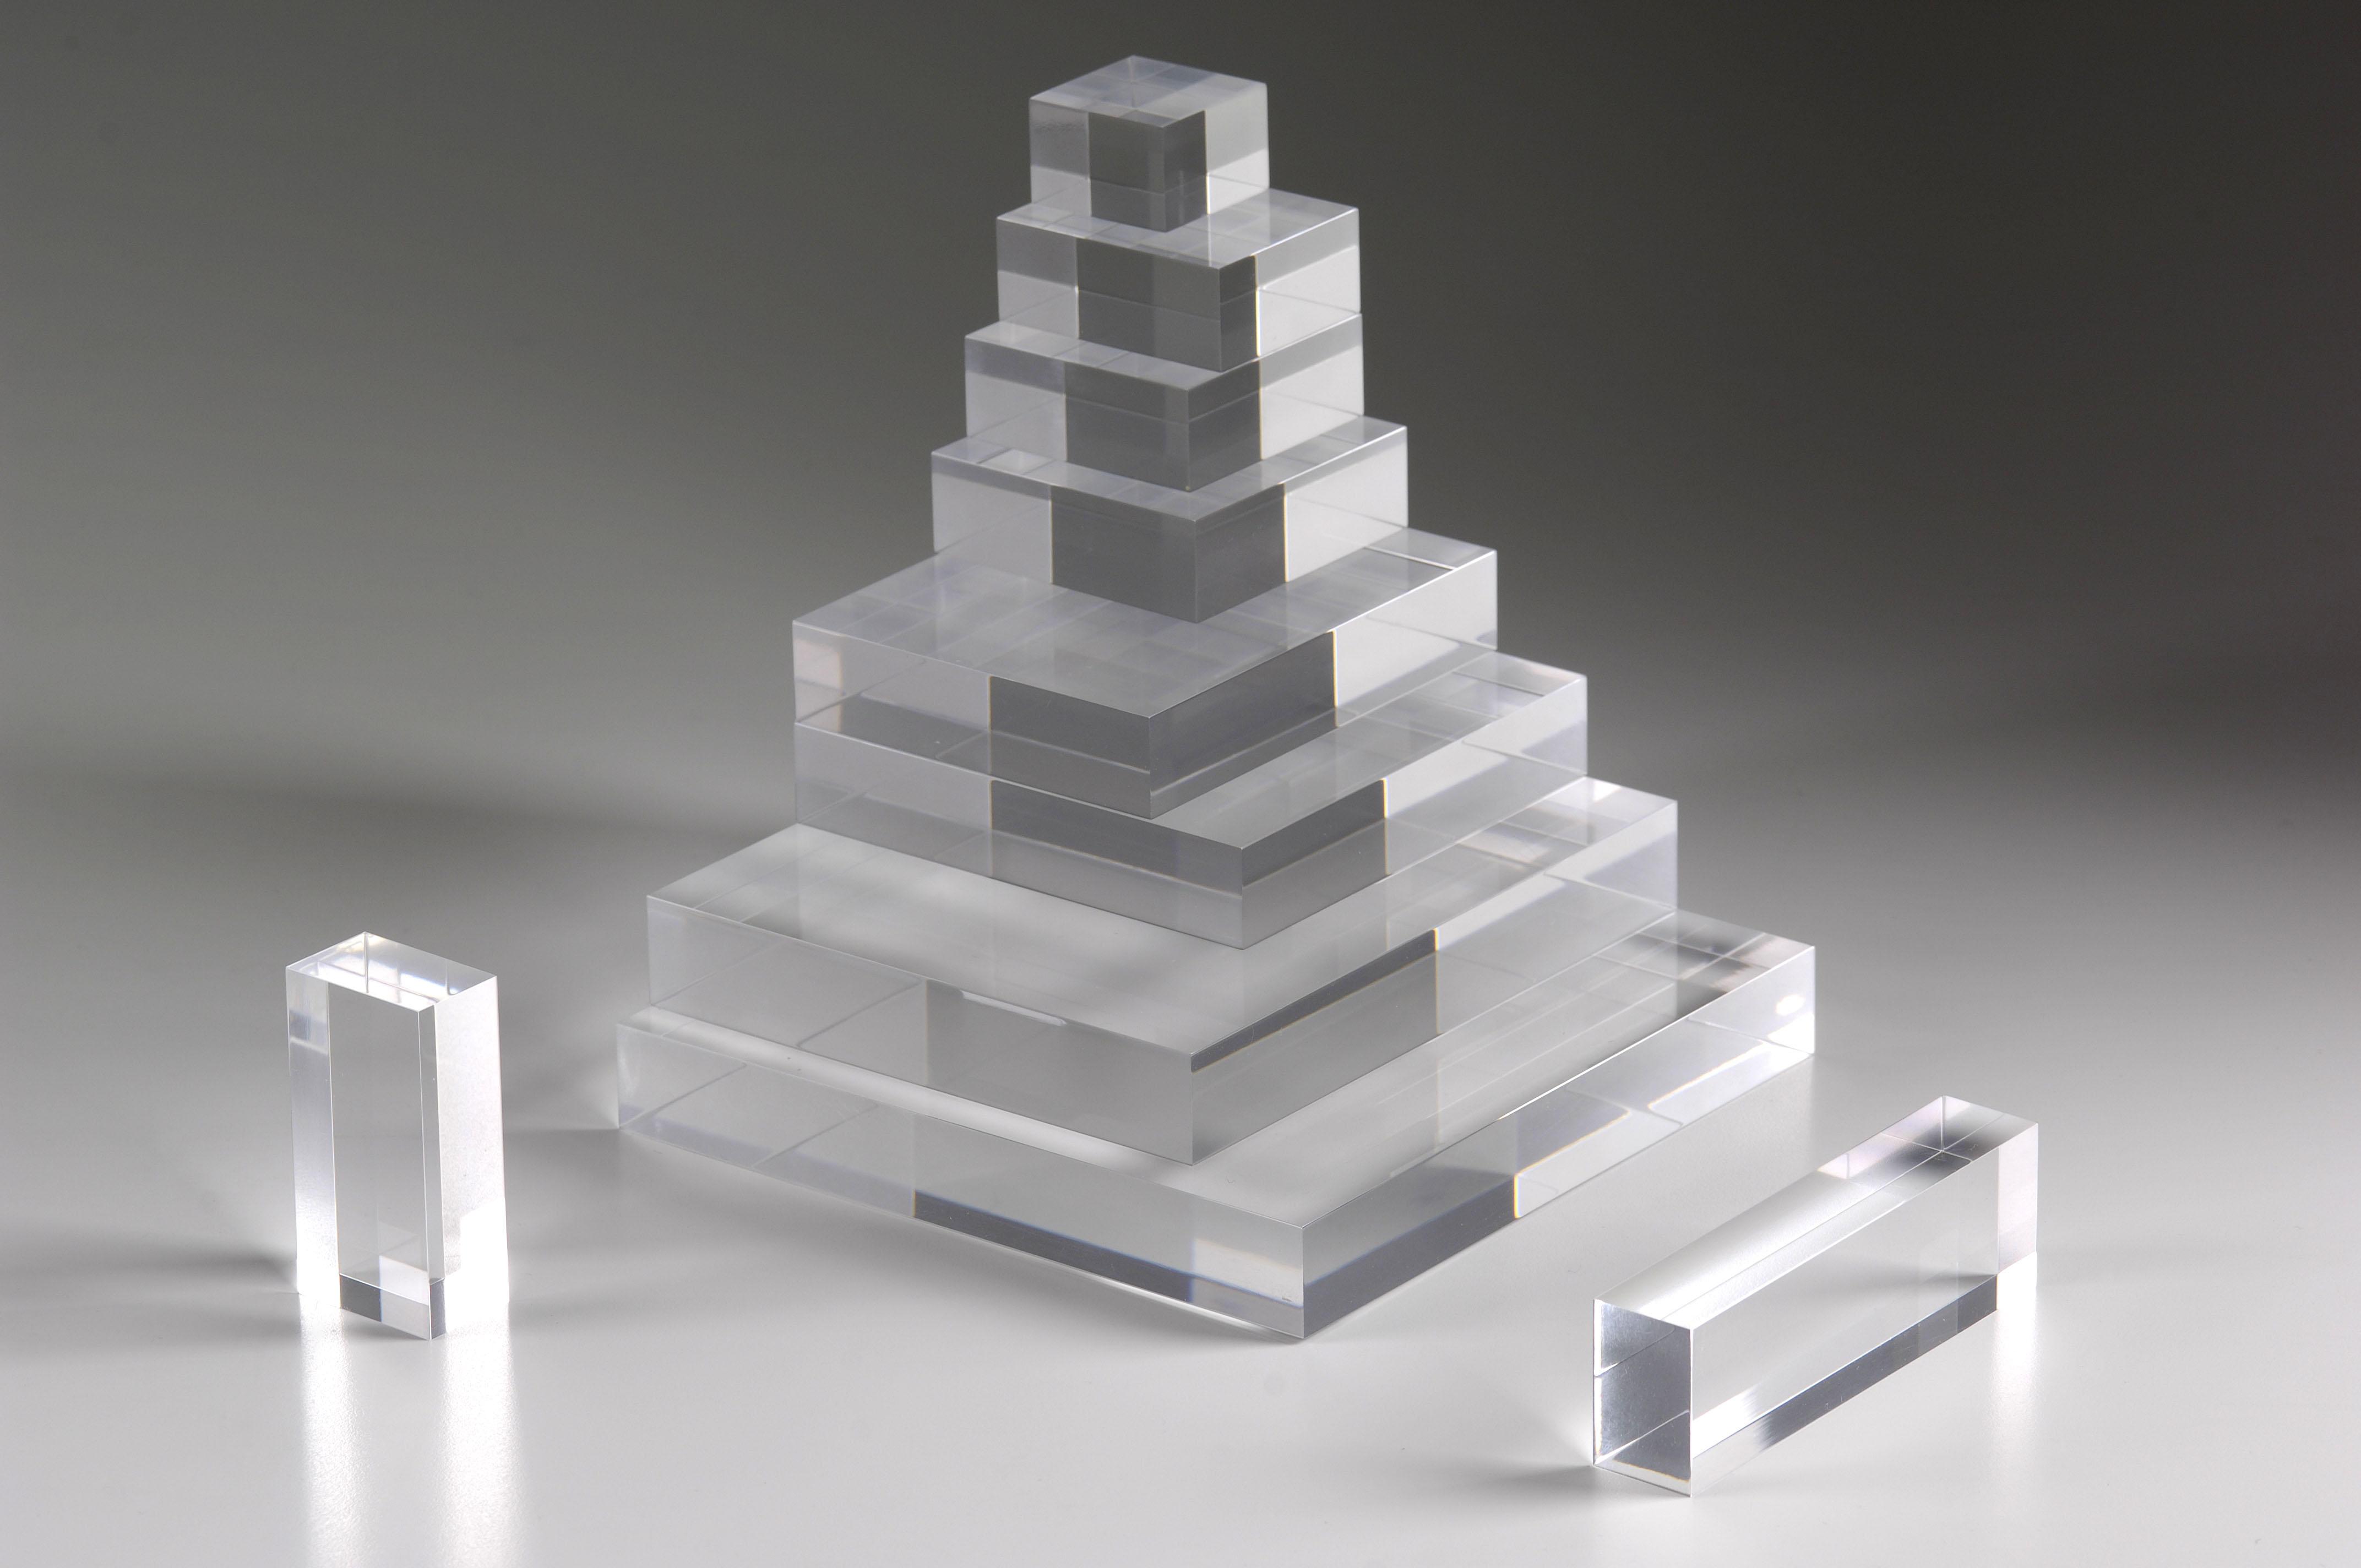 blocs en plexiglas et joncs en plexi pluxi objets en pmma. Black Bedroom Furniture Sets. Home Design Ideas